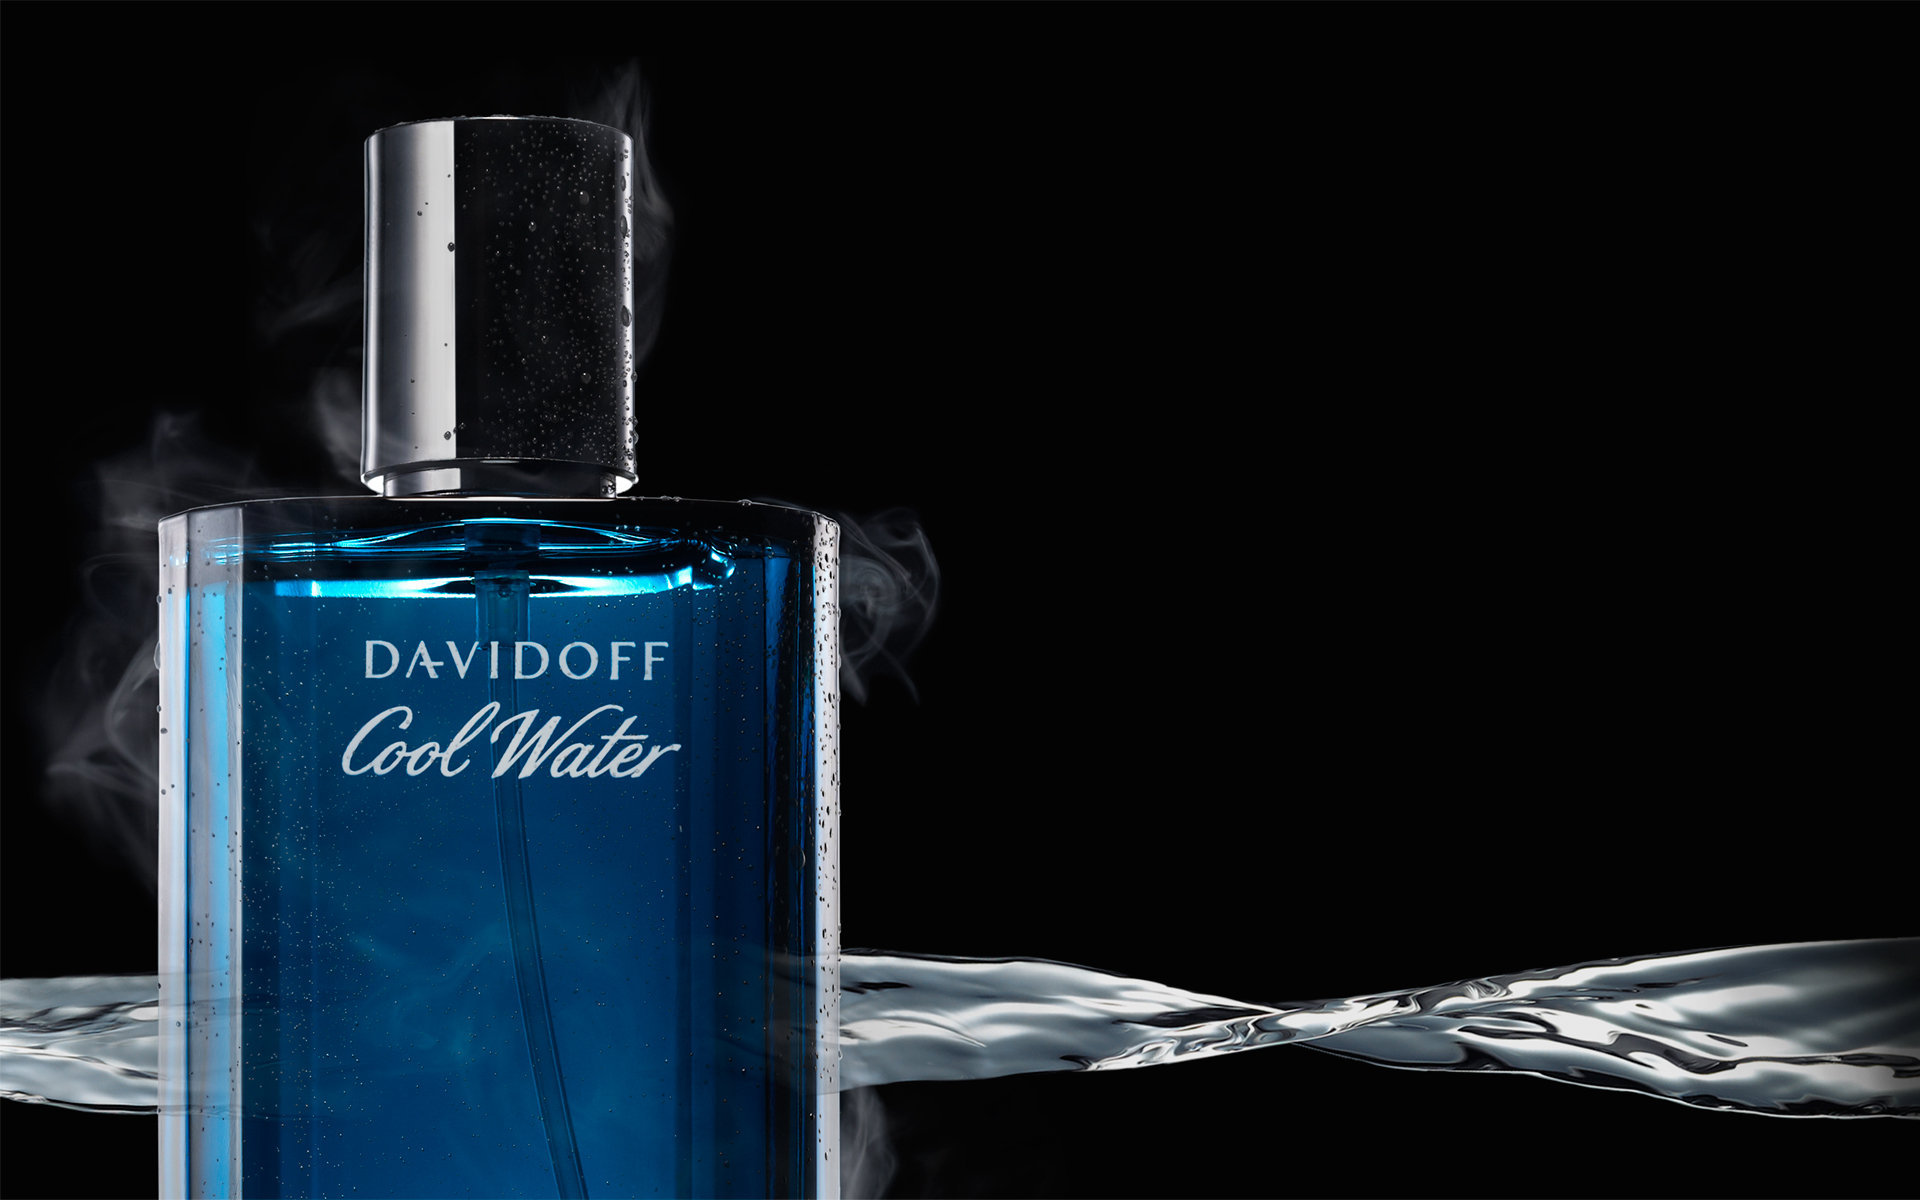 Davidoff-Cool-Water-(2).jpg